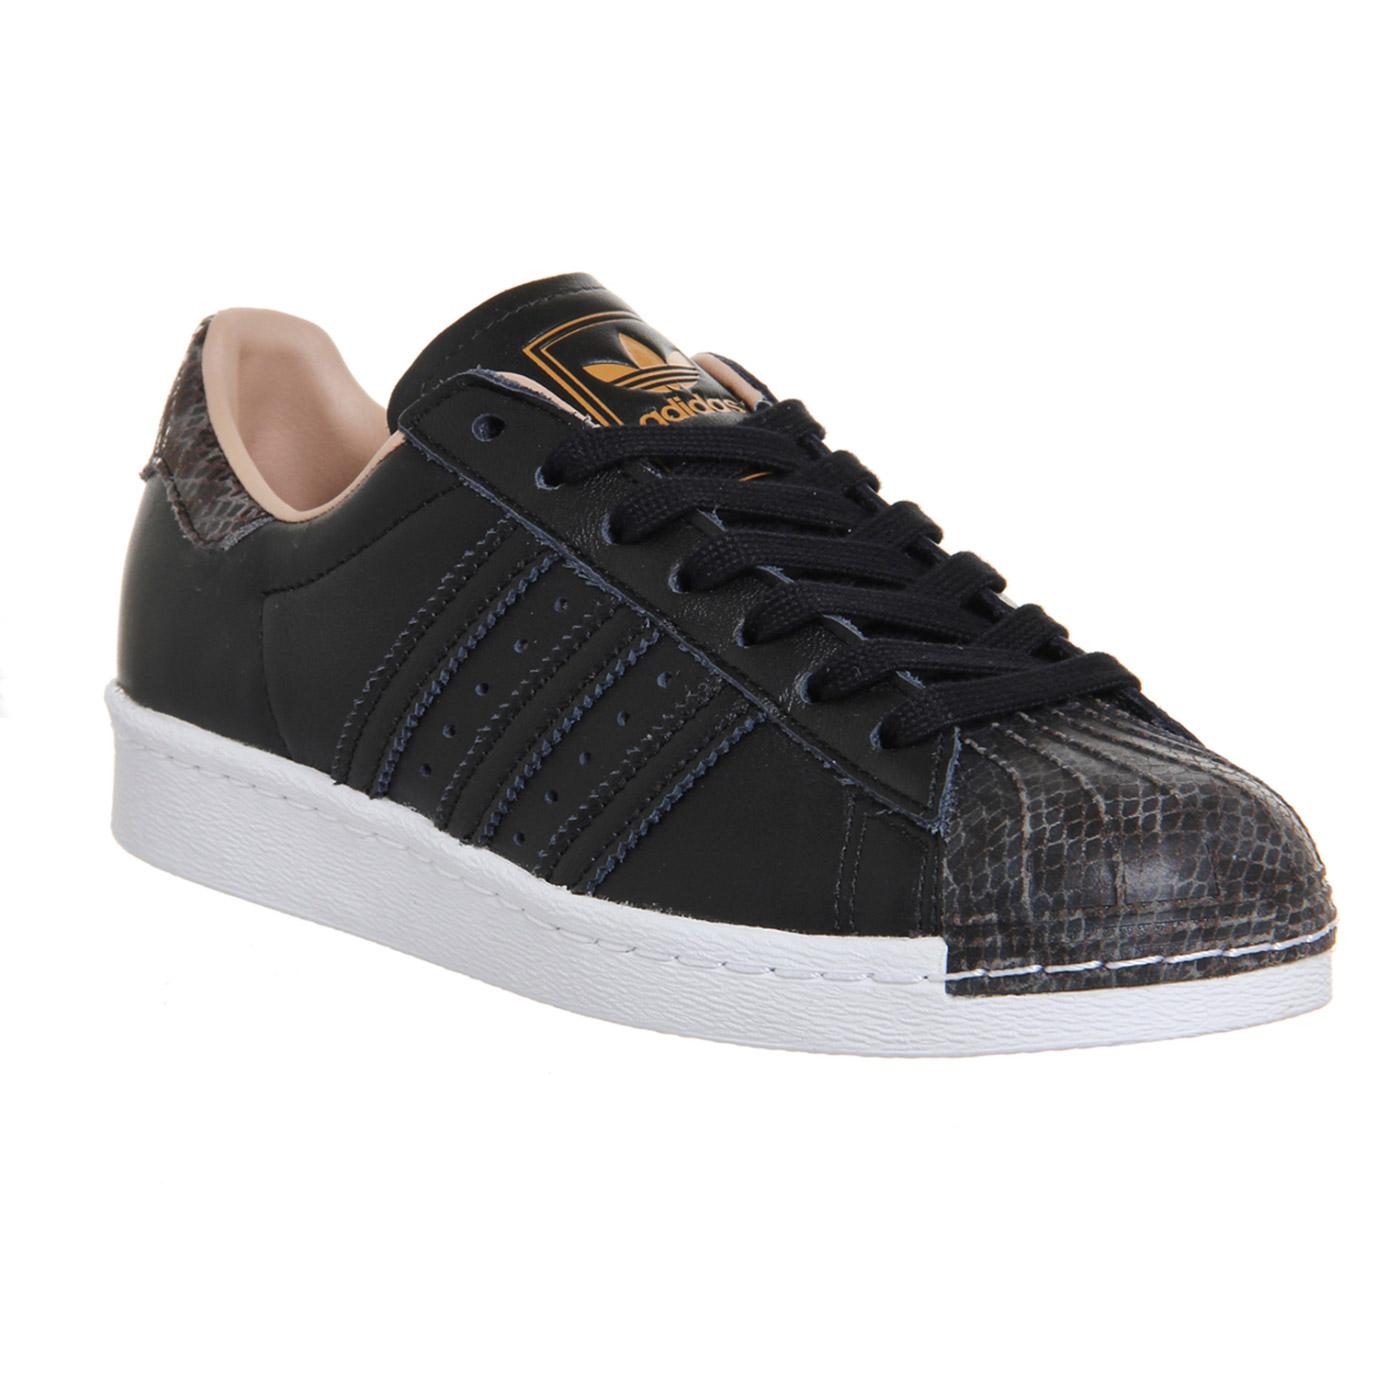 e597d1582954 Adidas Superstar 80s Black Rose Snake Toe Trainers